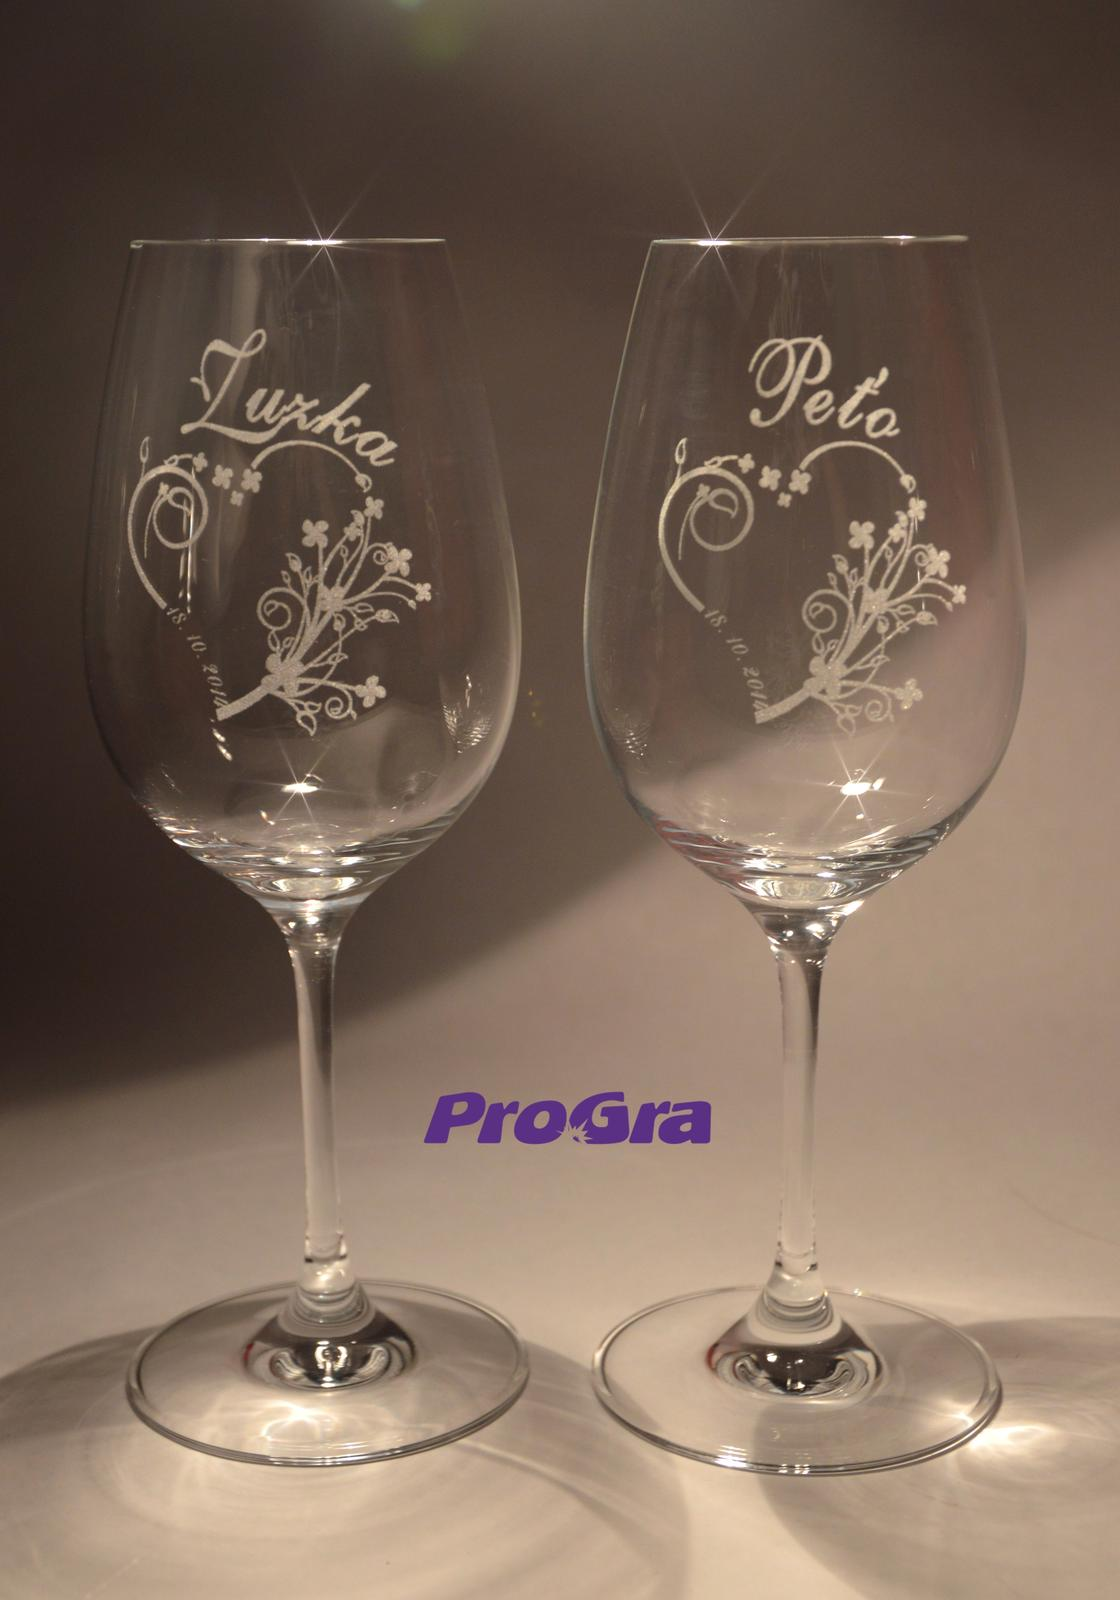 Svatební skleničky - Svatební skleničky Viera